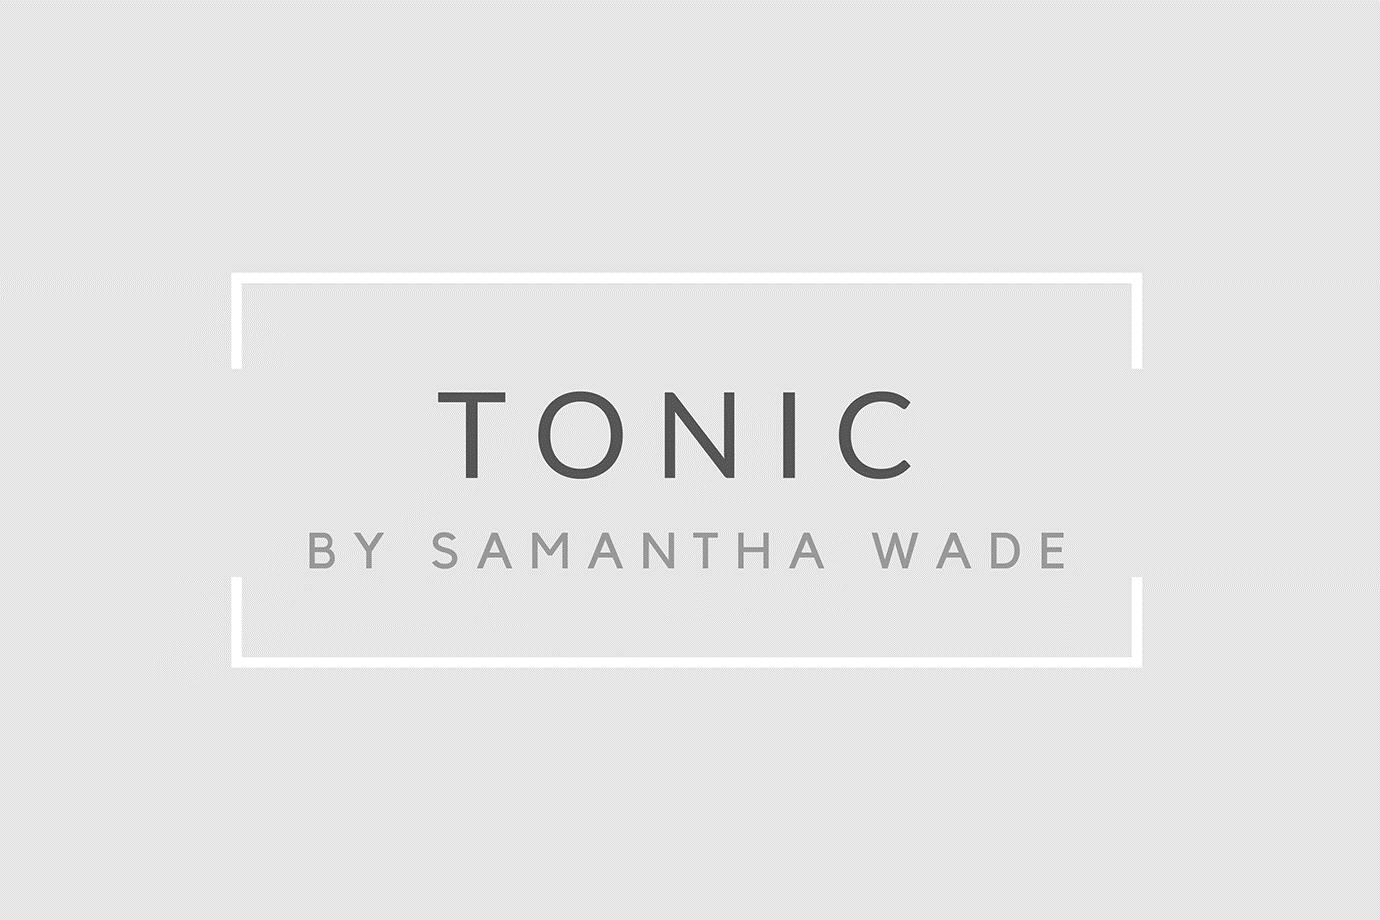 Tonic by Samantha Wade